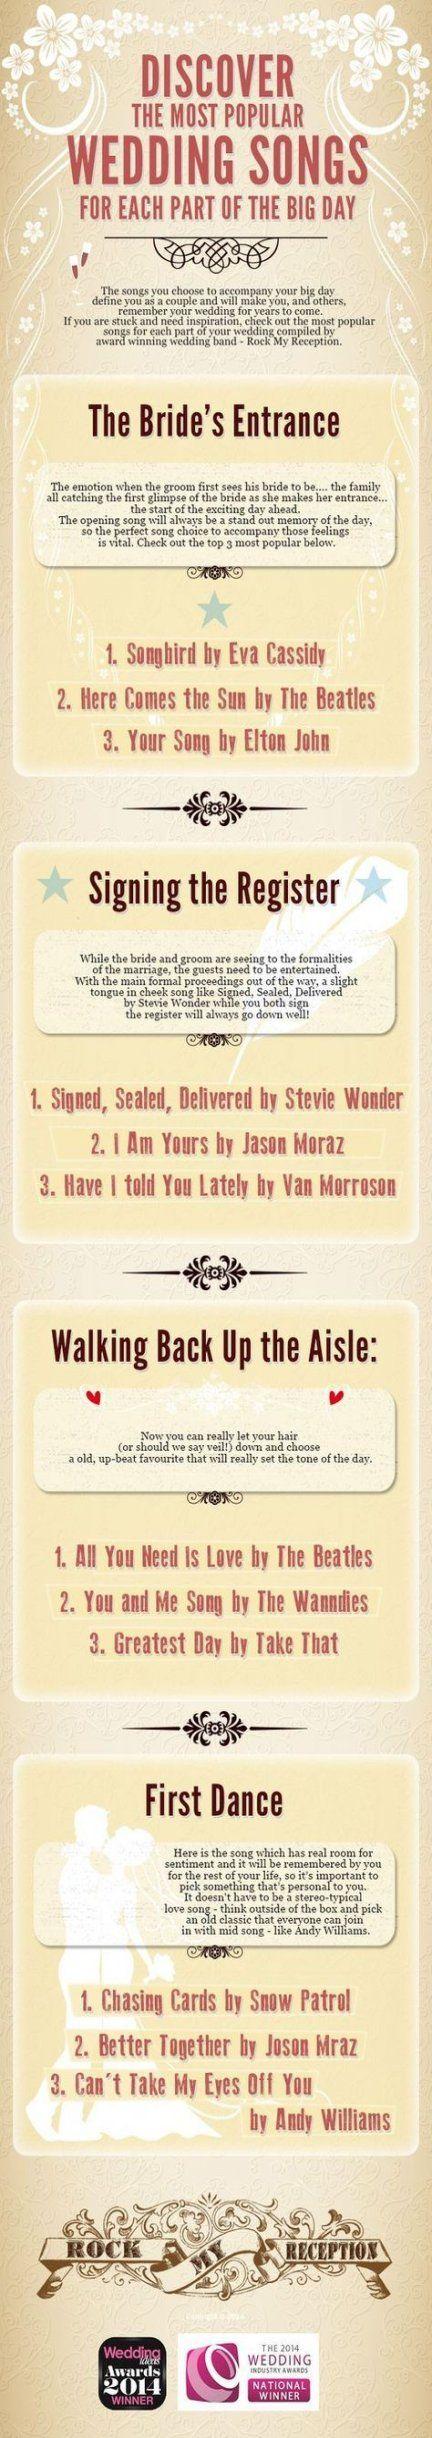 65 Ideas Wedding Songs Ceremony Christian Песни, Свадьба